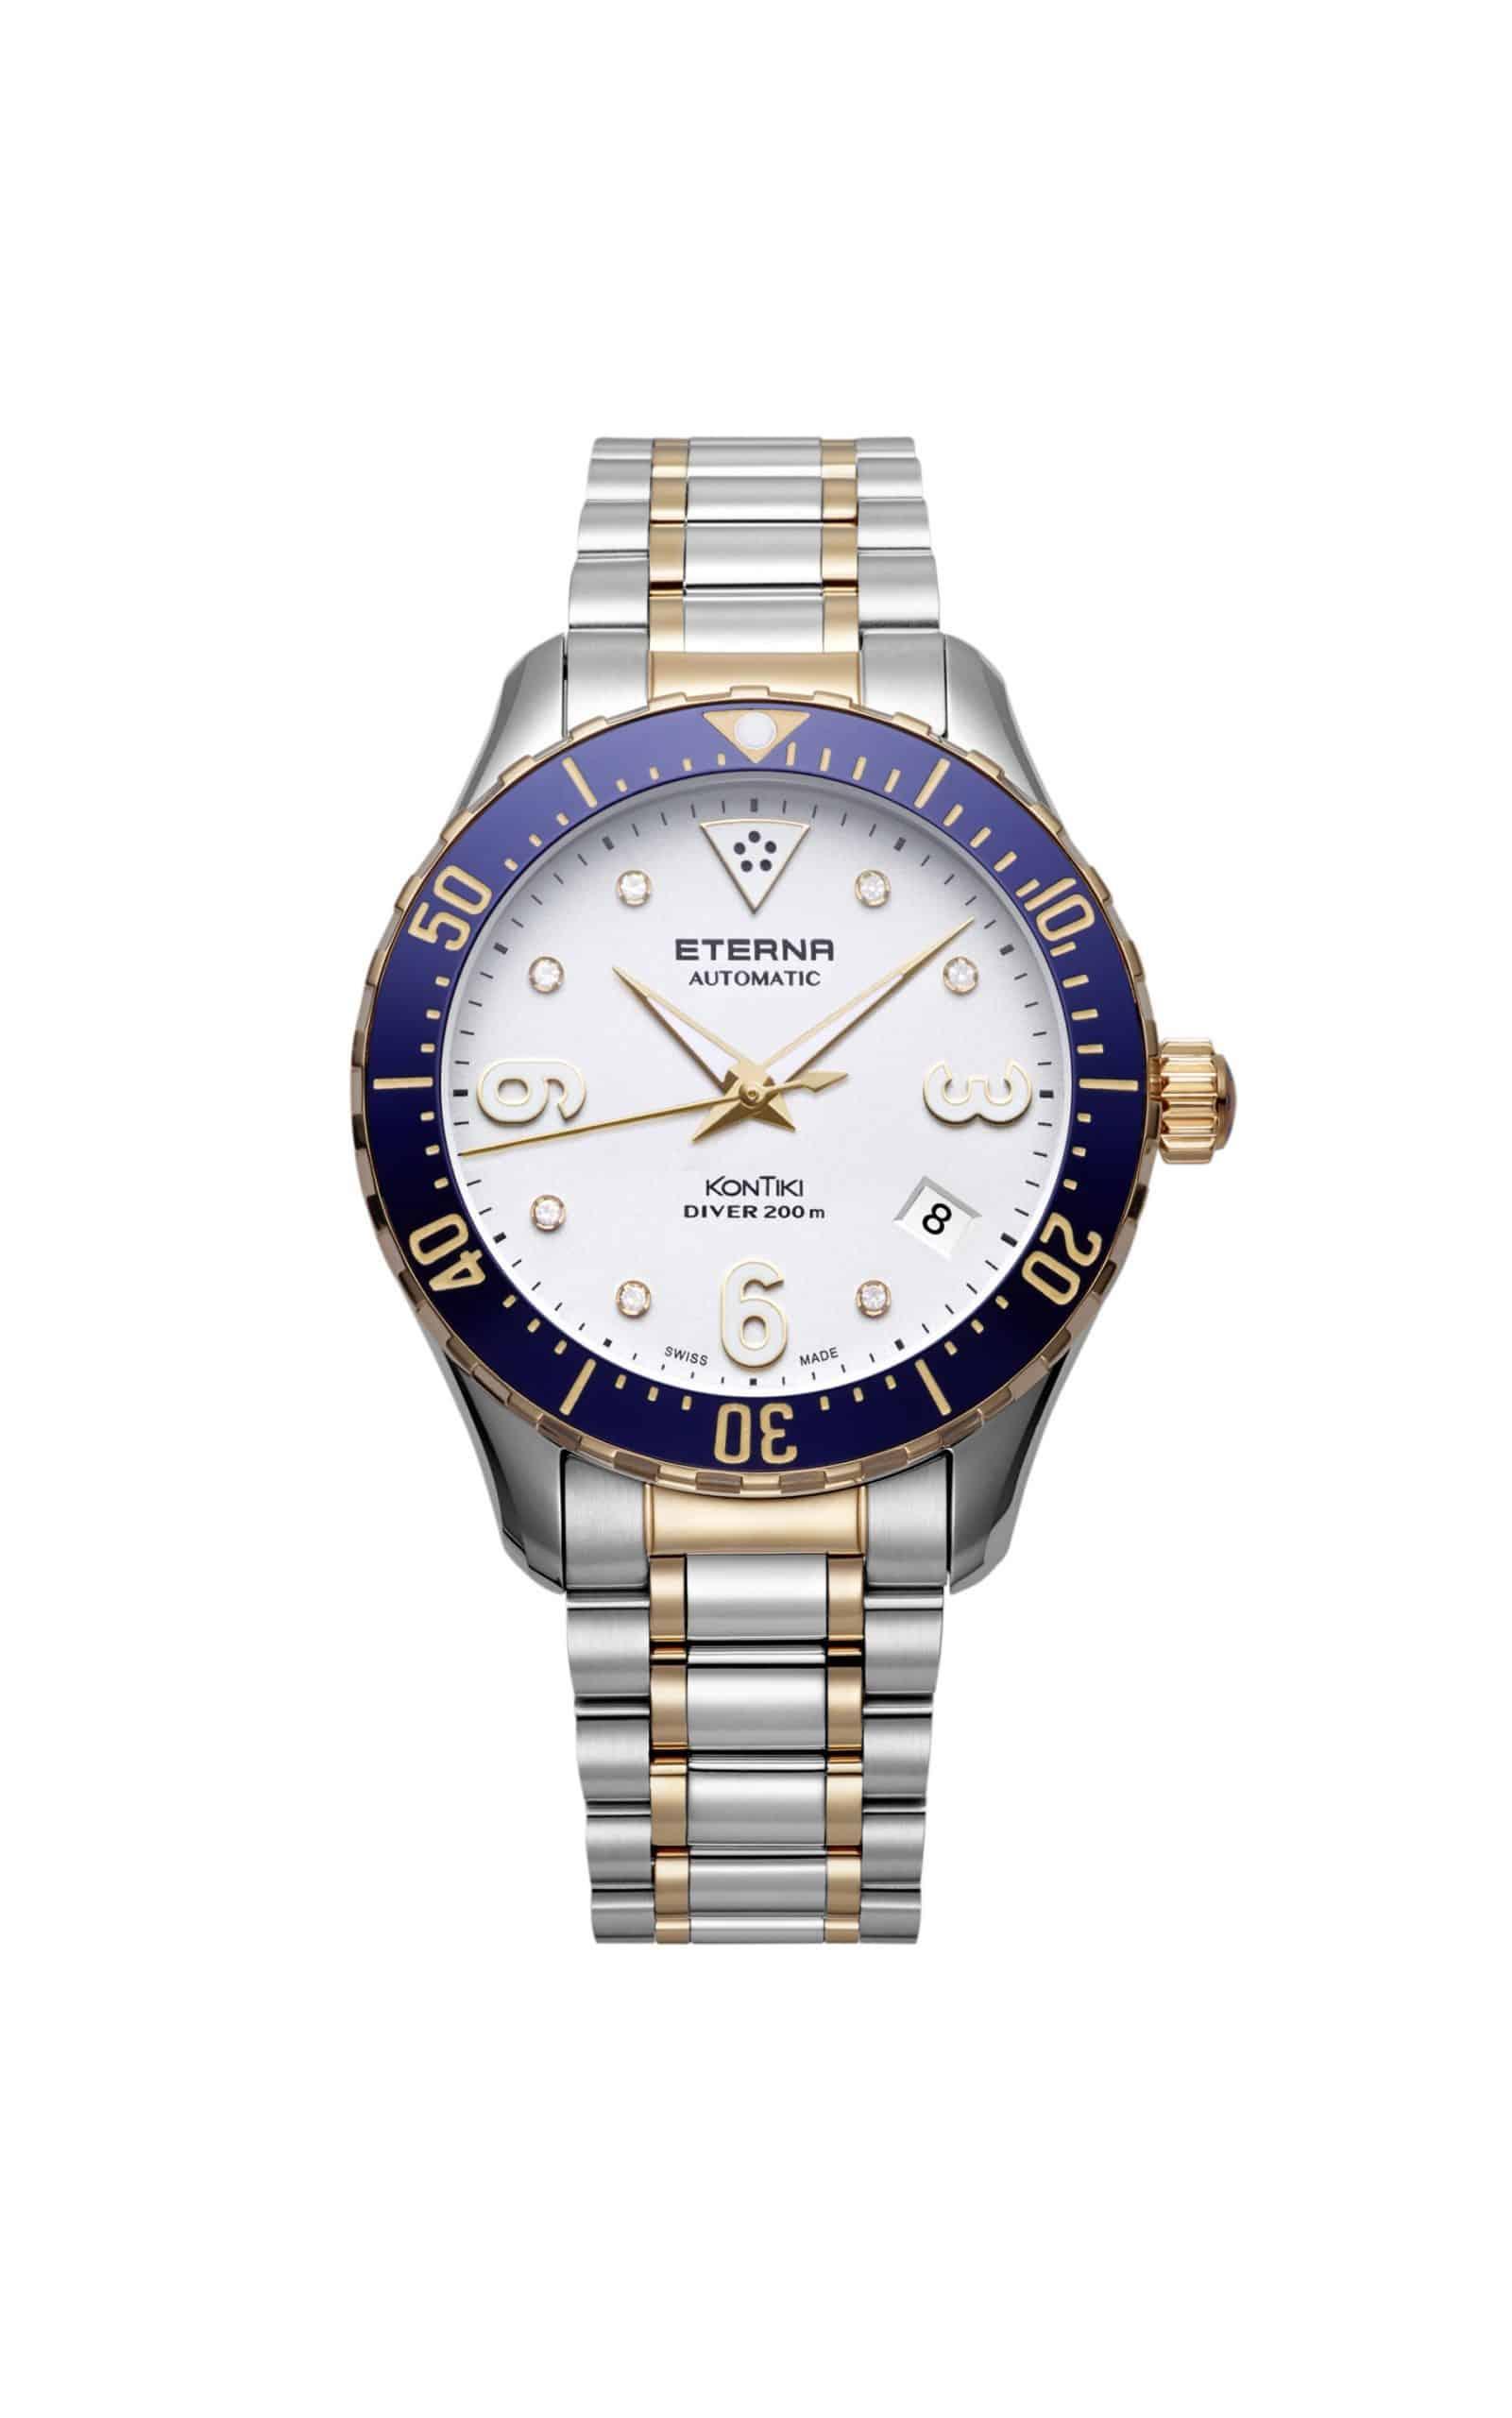 PR Lady KonTiki Diver Pictures Eterna Lady KonTiki Diver stainless steel PVD 5N white dial bicolor bracelet scaled